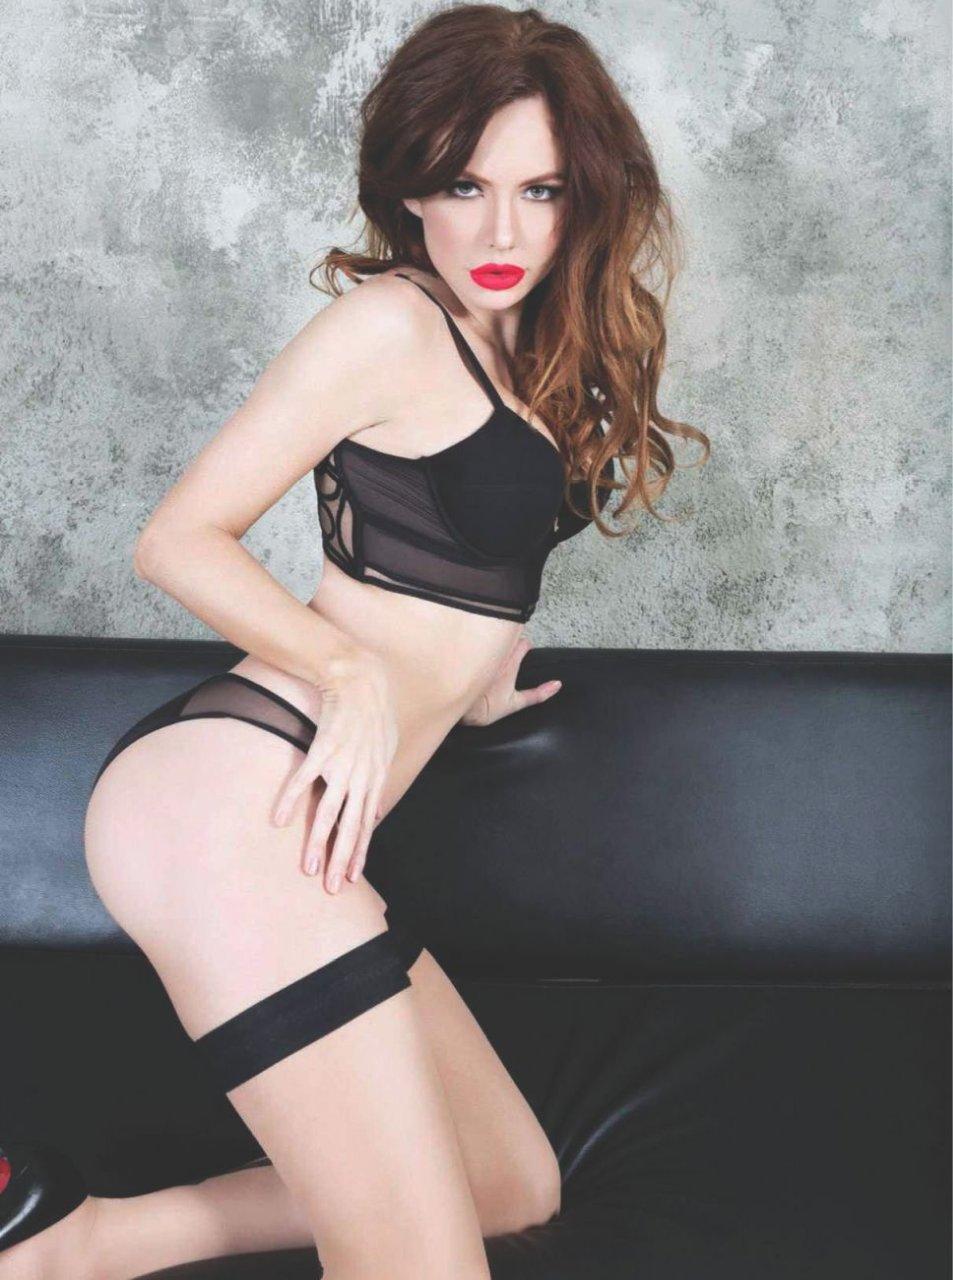 Yuliya lasmovich sexy